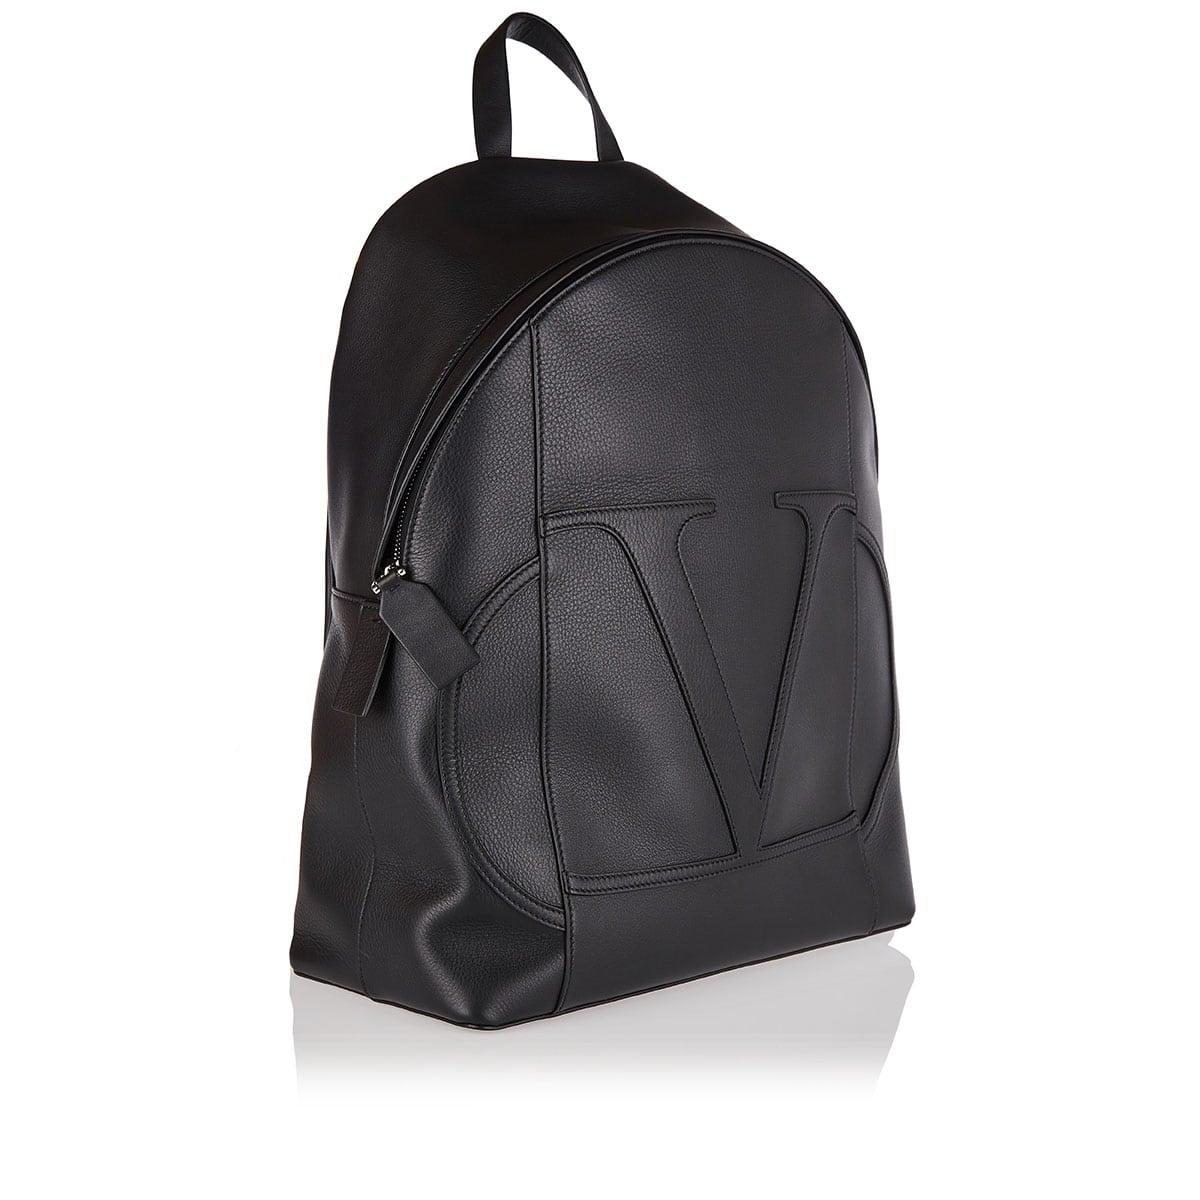 VLOGO leather Backpack